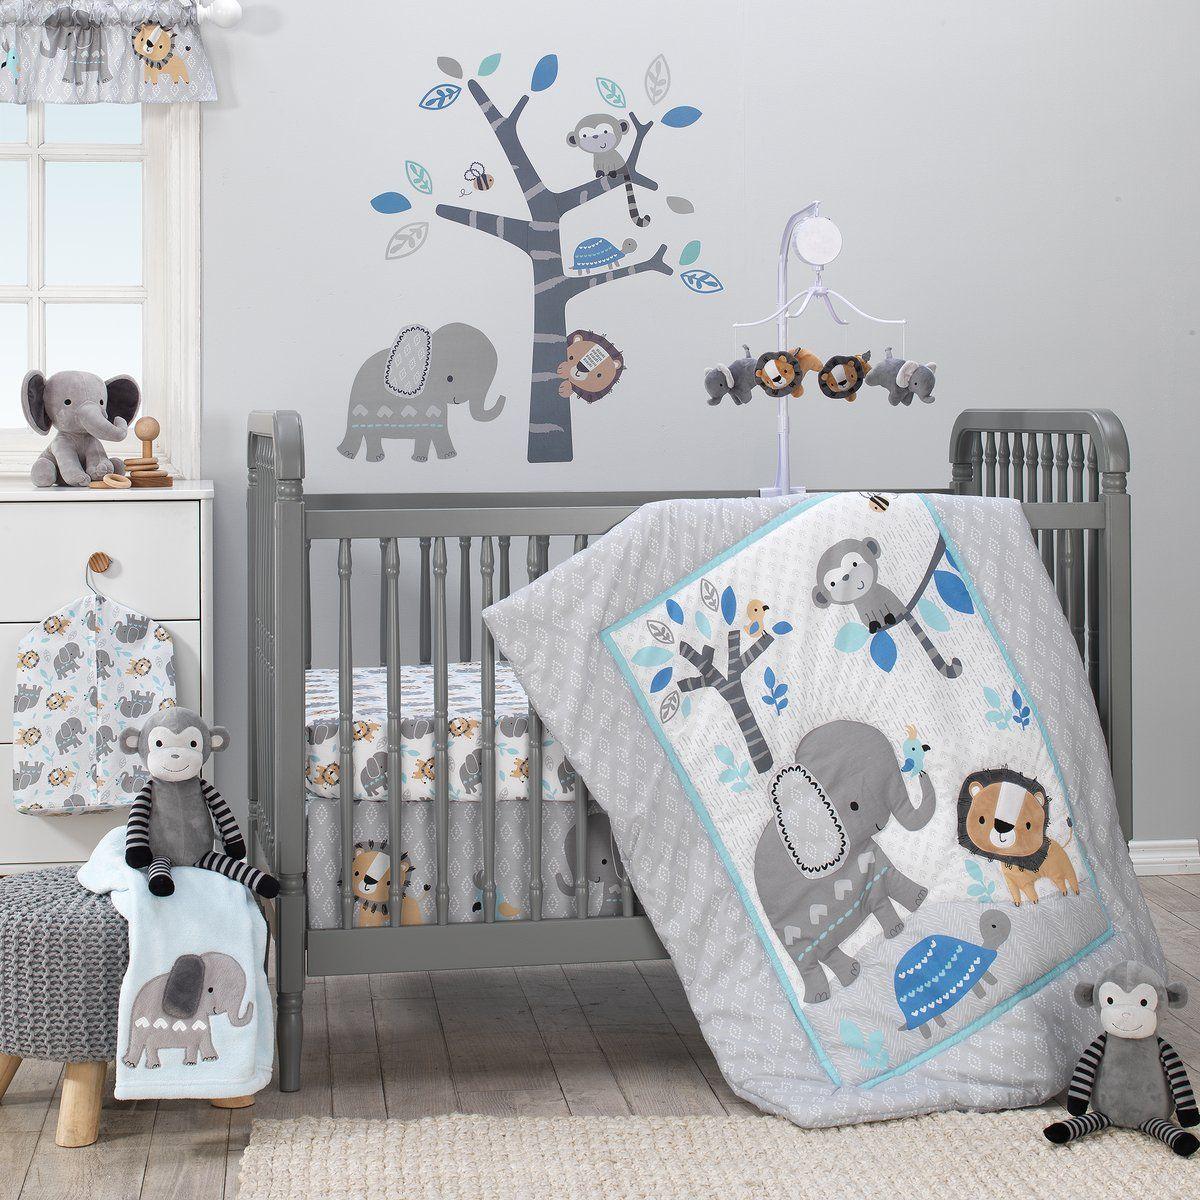 Jungle Fun 3 Piece Crib Bedding Set Baby Boy Room Nursery Crib Bedding Sets Baby Bed 3 piece crib bedding set